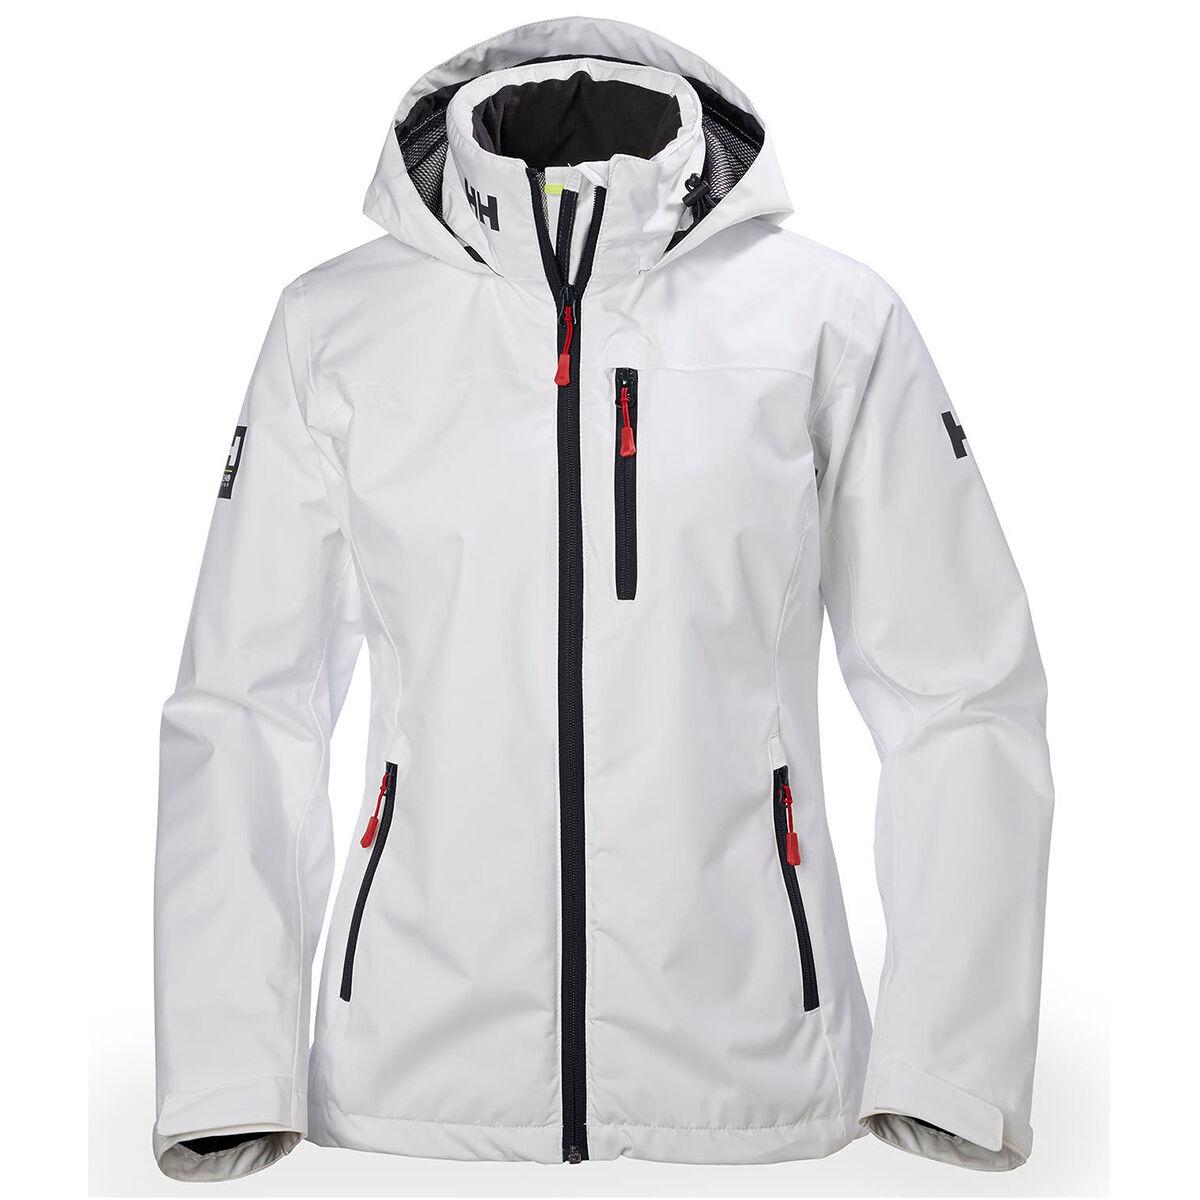 Helly Hansen Women's Hooded Crew Jacket